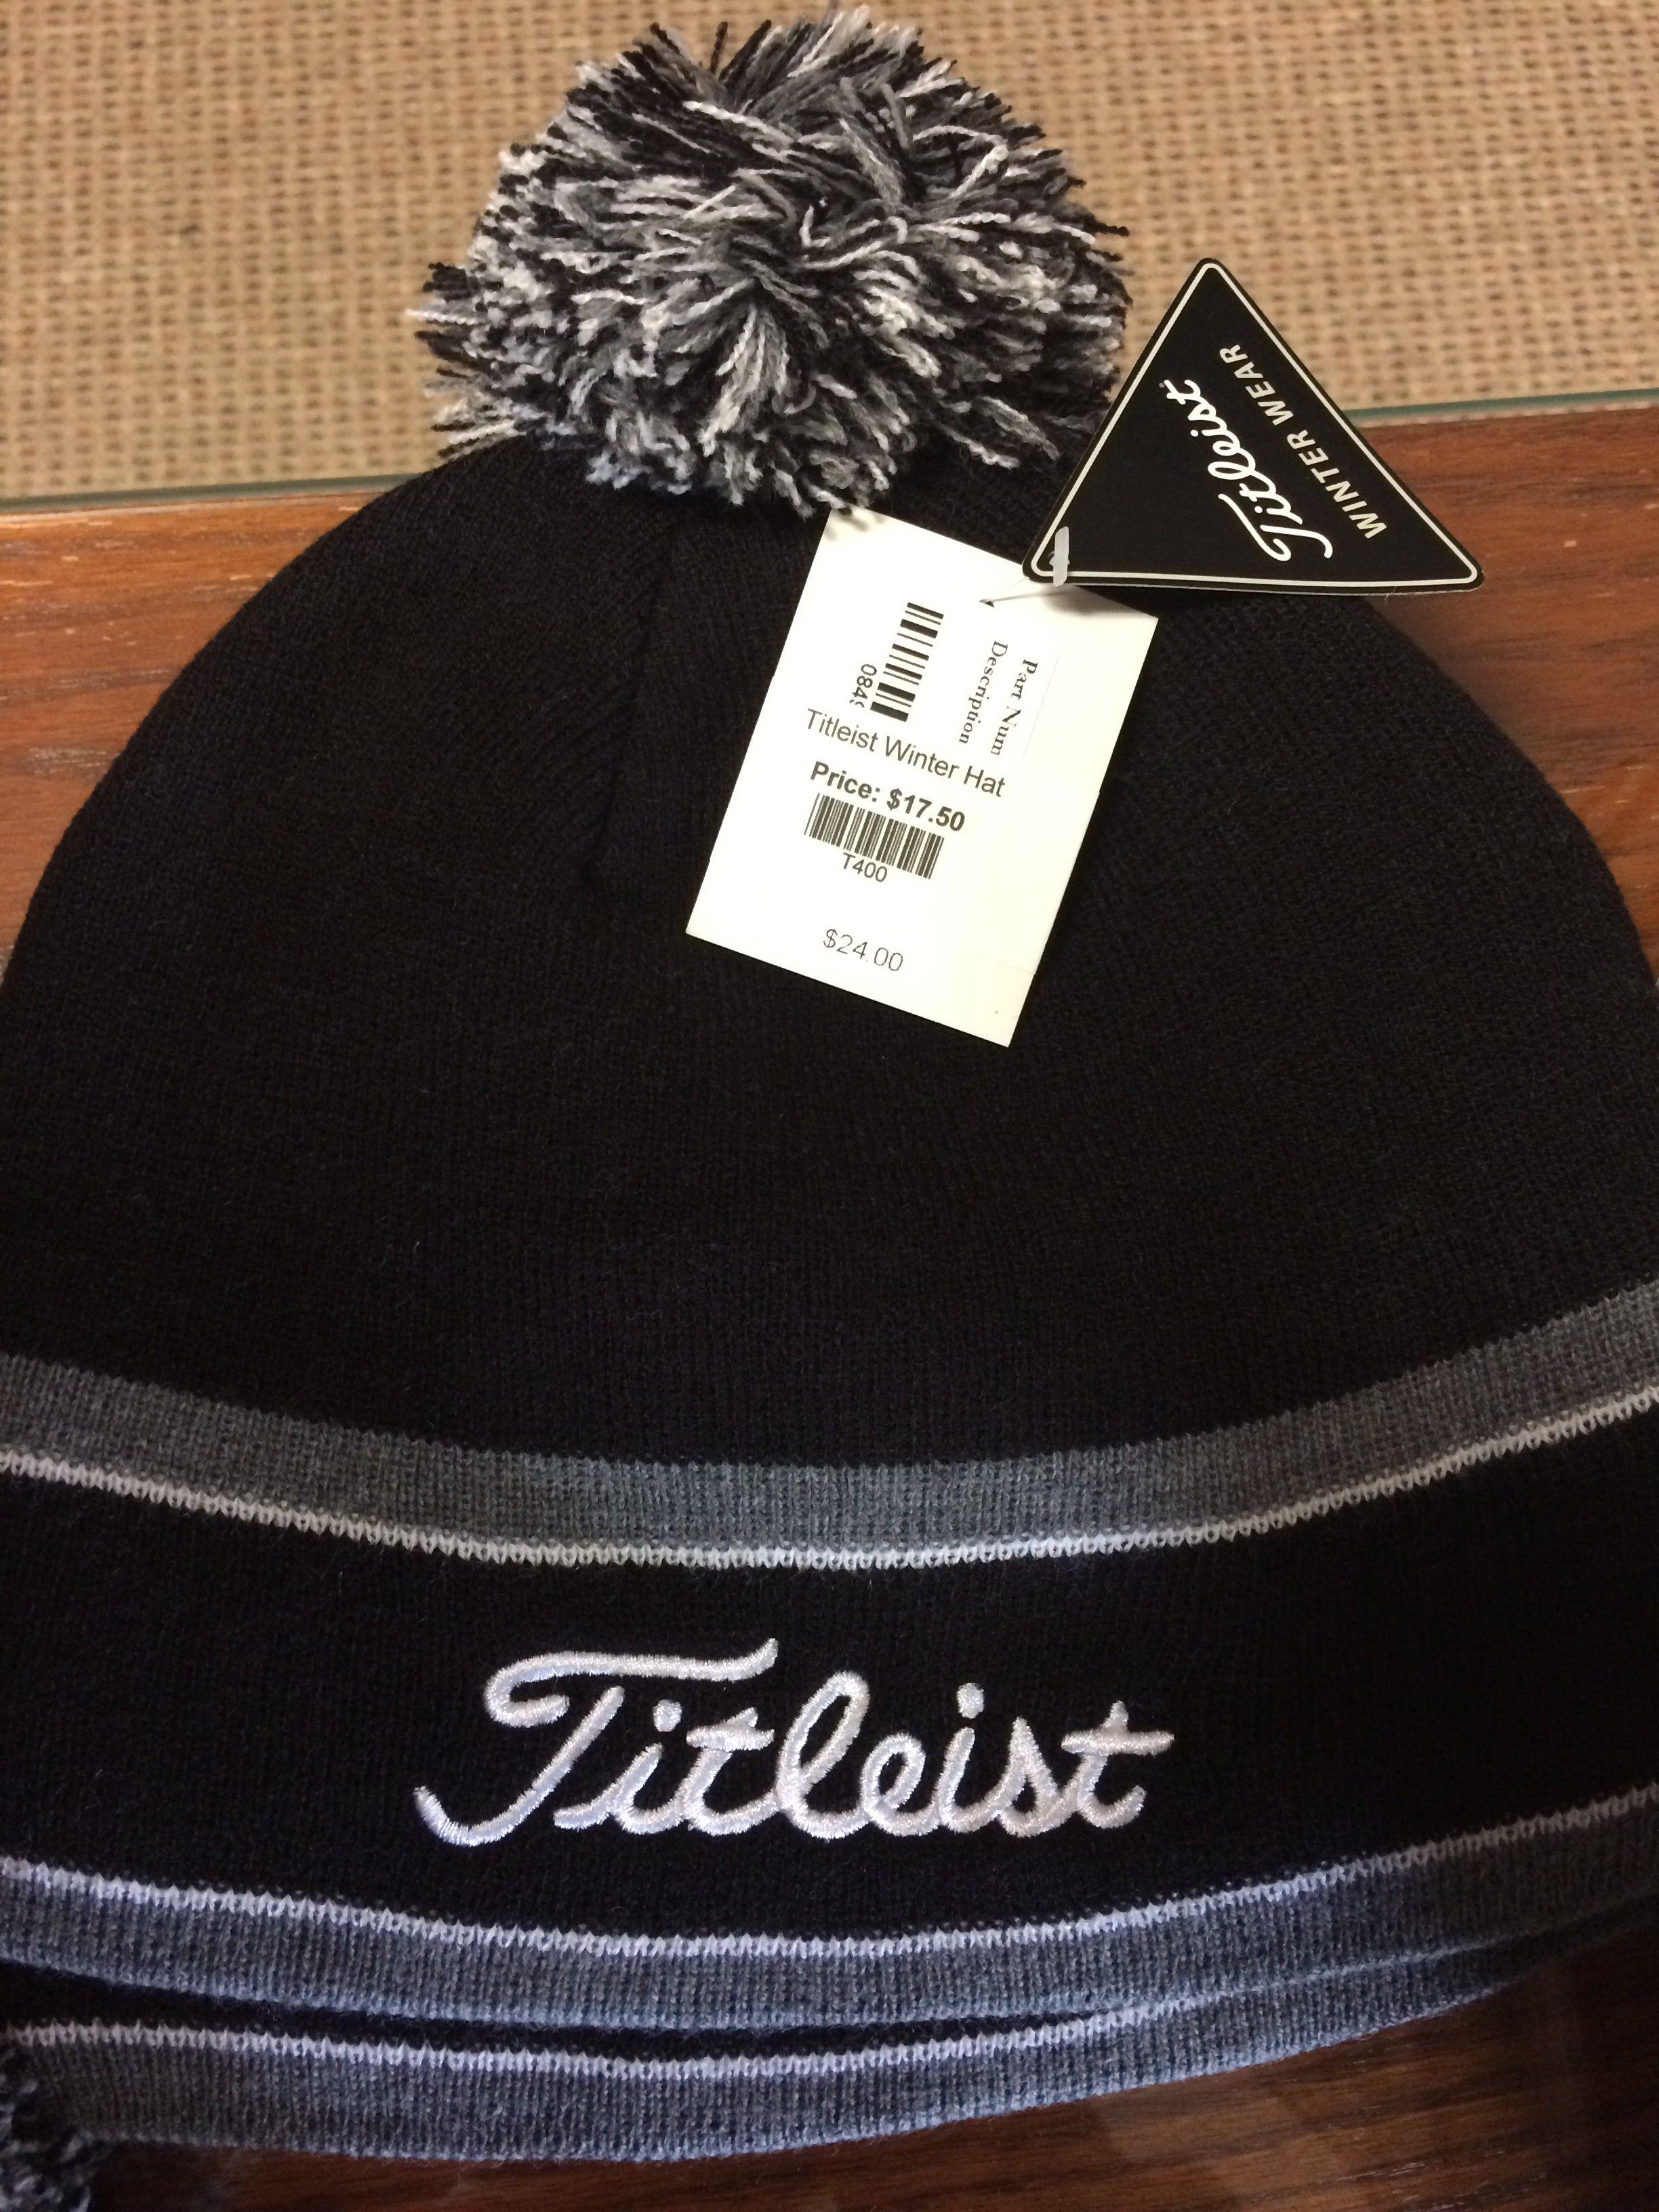 c54877e6852 Titleist winter hat